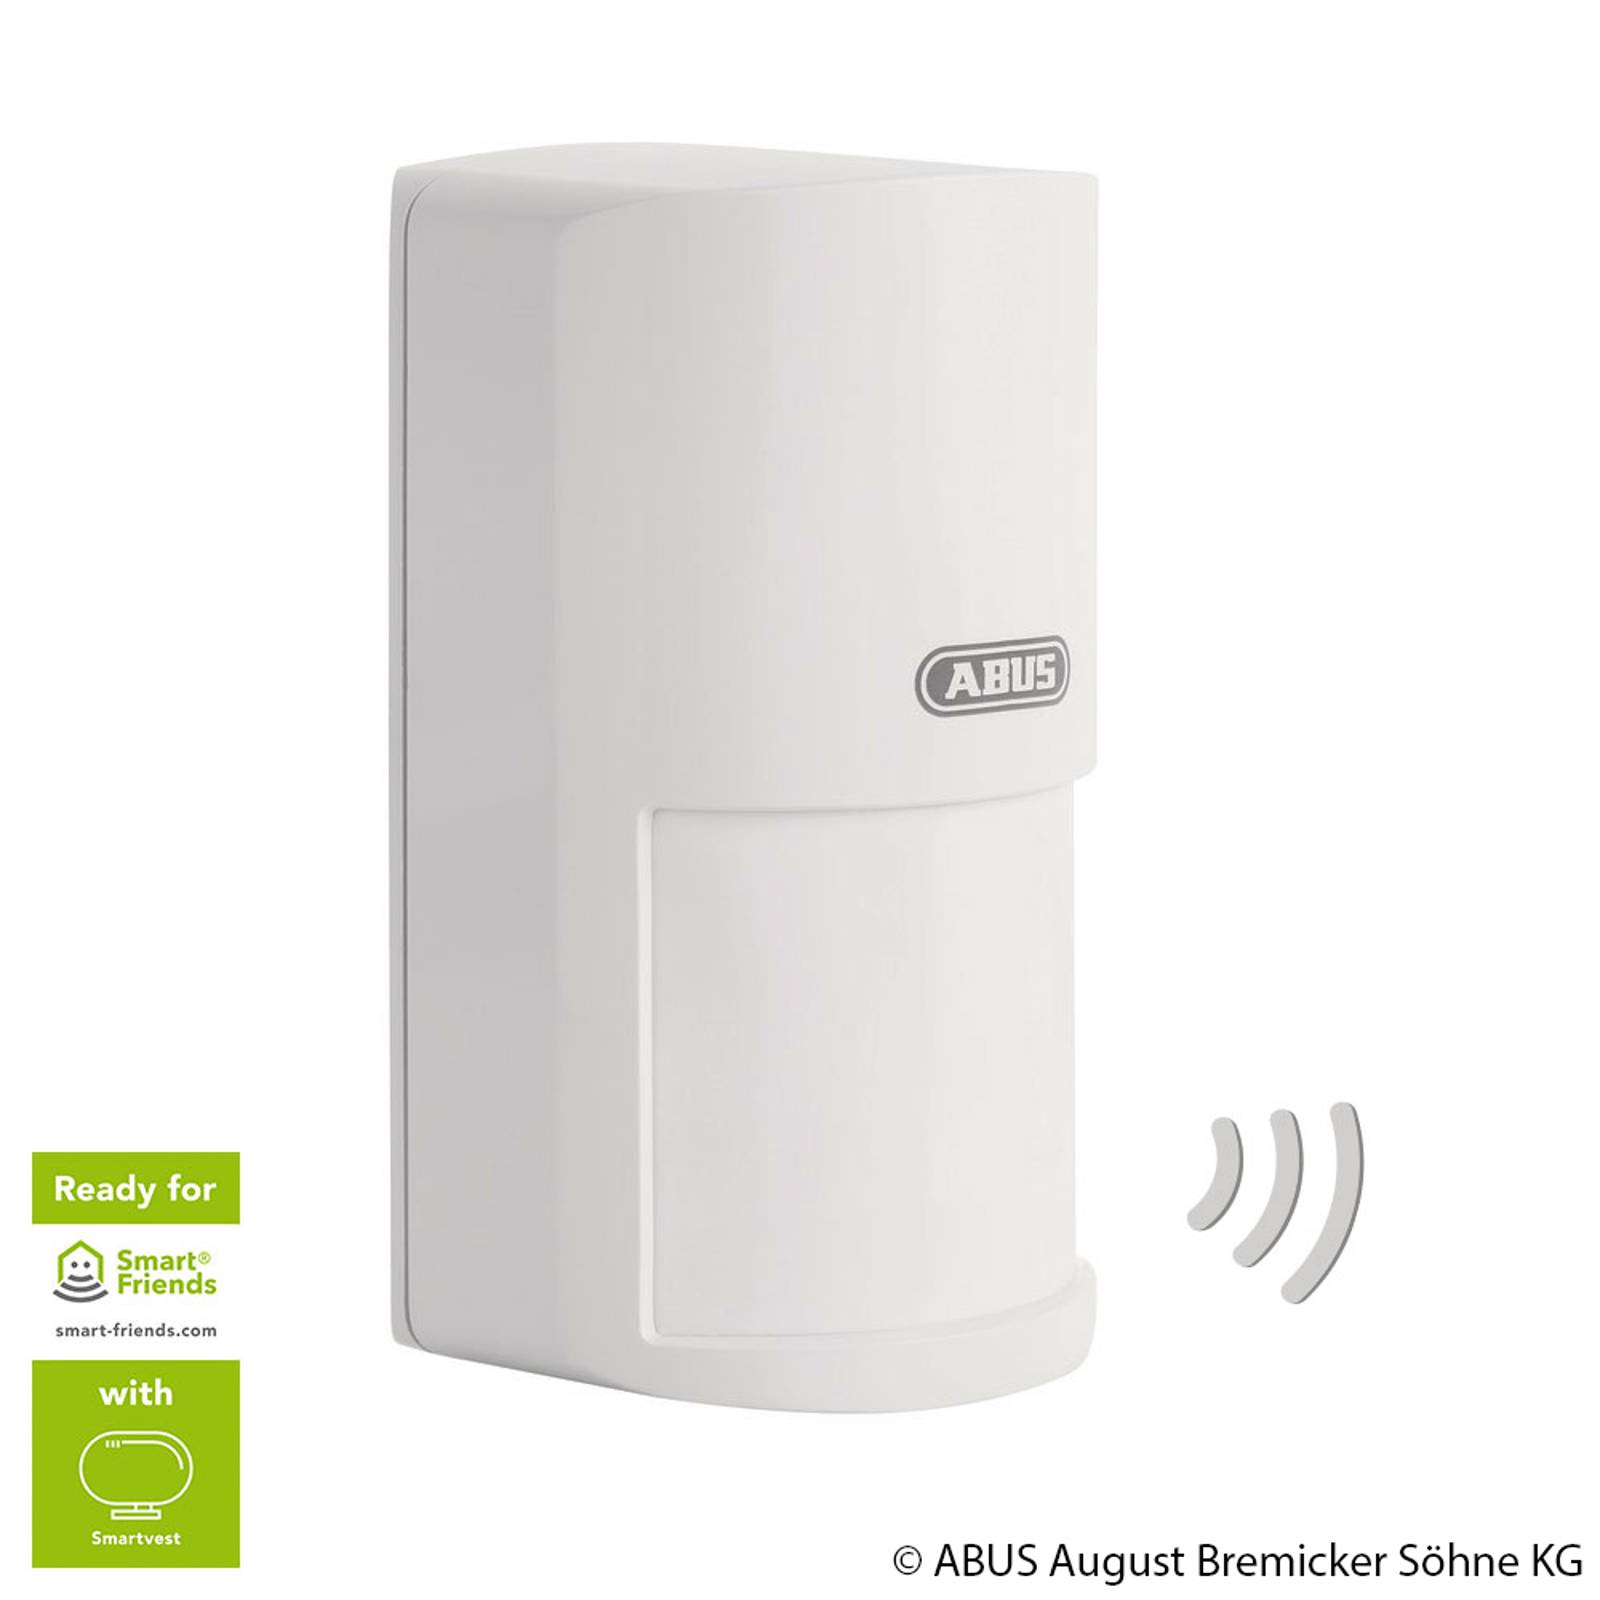 ABUS Smartvest trådlös-rörelsesensor